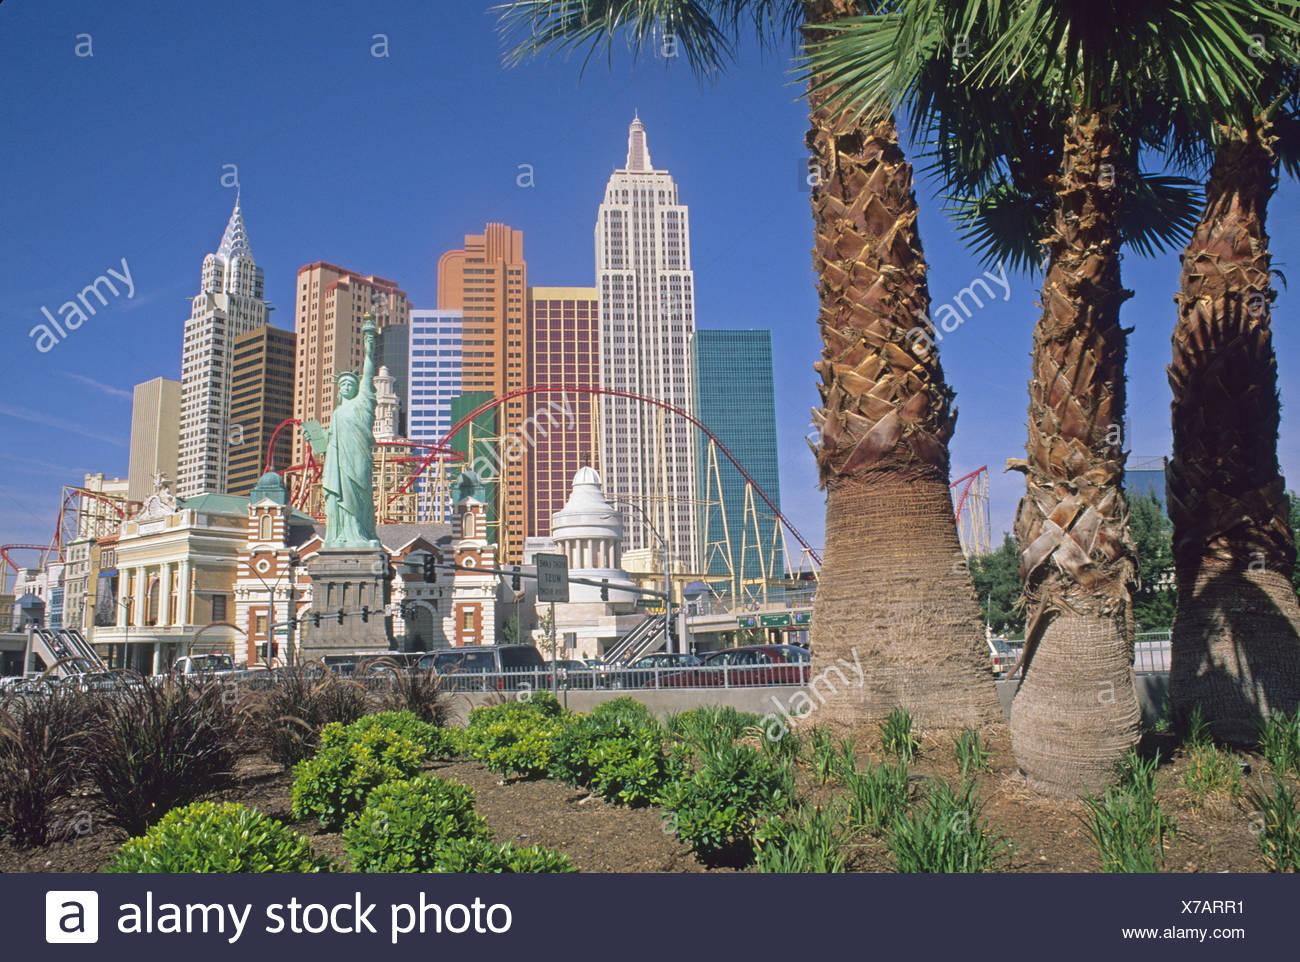 New York New York Hotel Casino Las Vegas Nevada - Stock Image